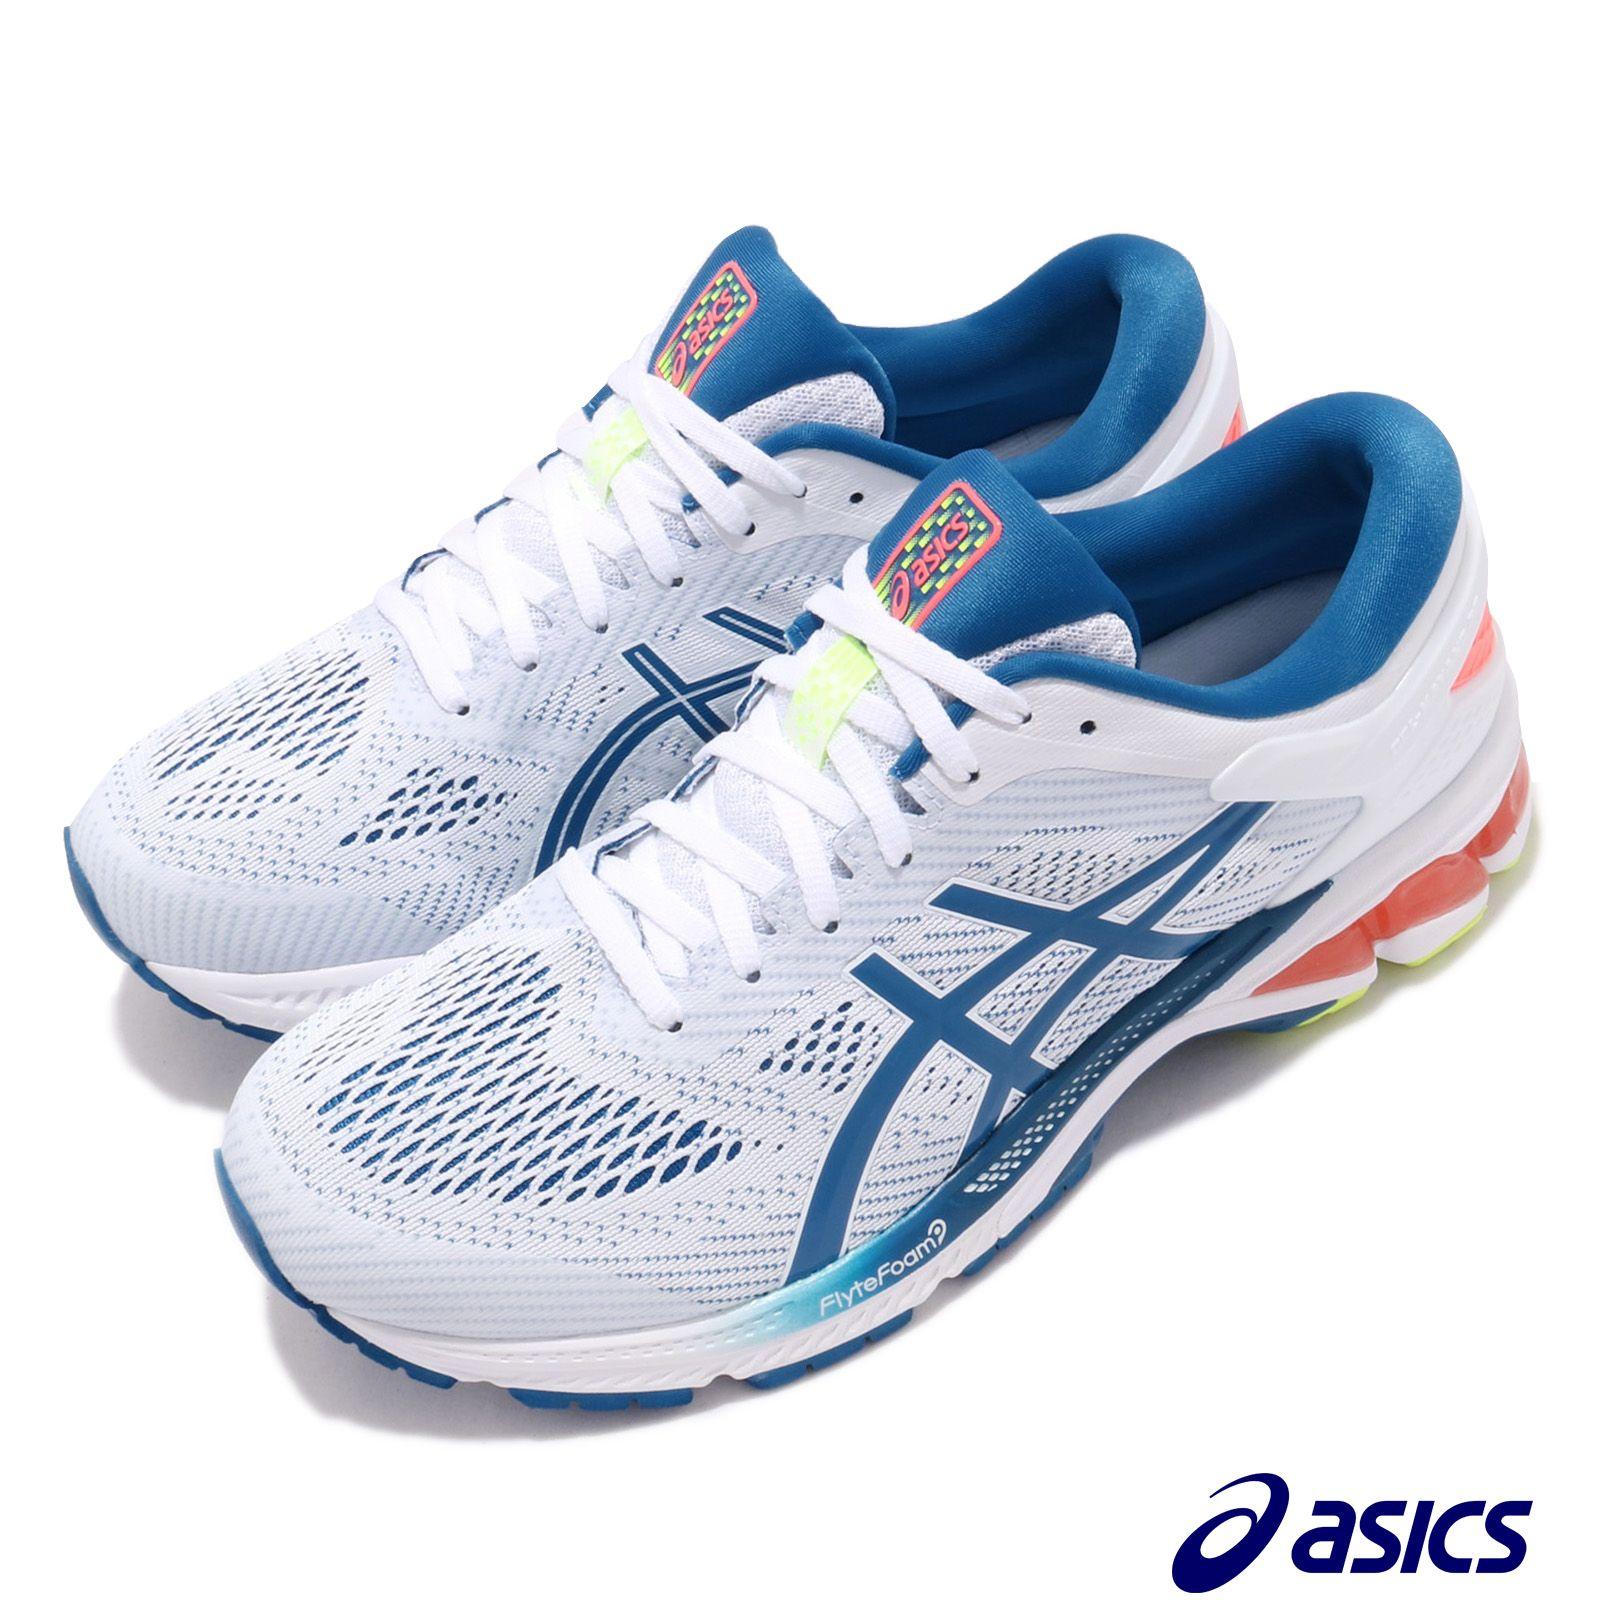 Asics 慢跑鞋 Gel Kayano 26 運動 男鞋 1011A541100